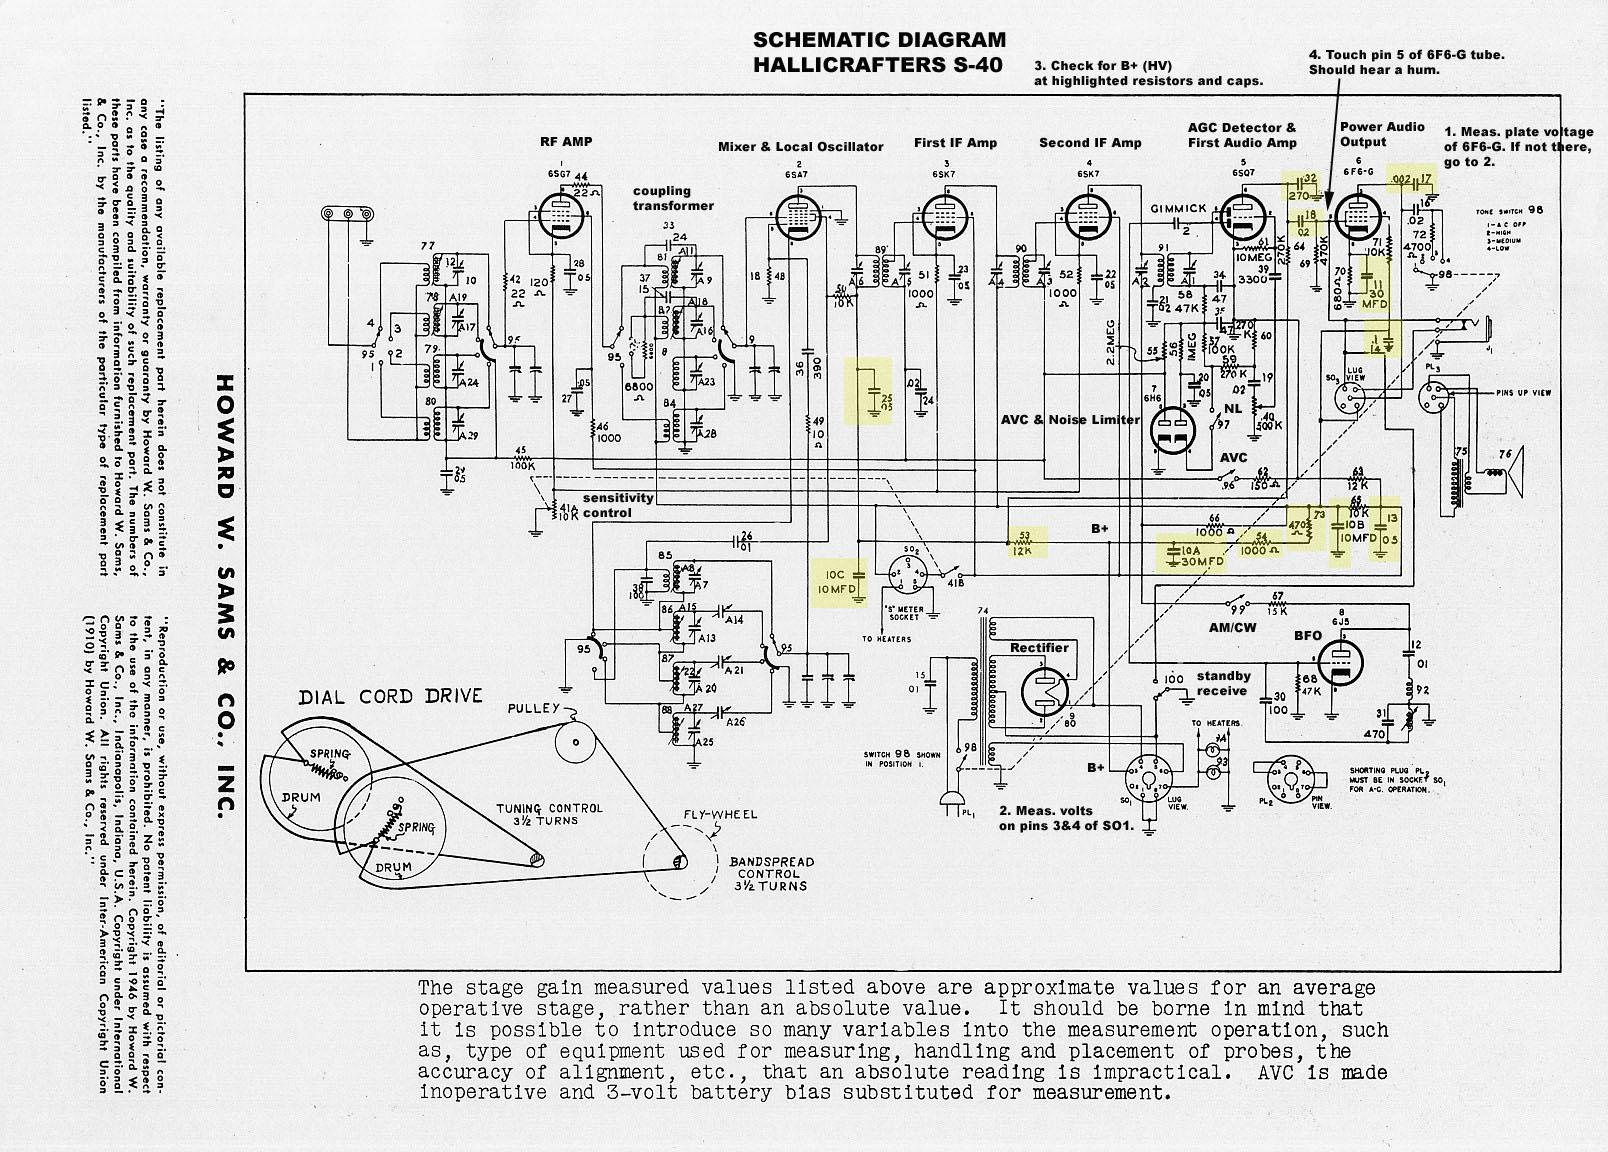 Hallicrafters Model S 40 General Coverage Short Wave Receiver